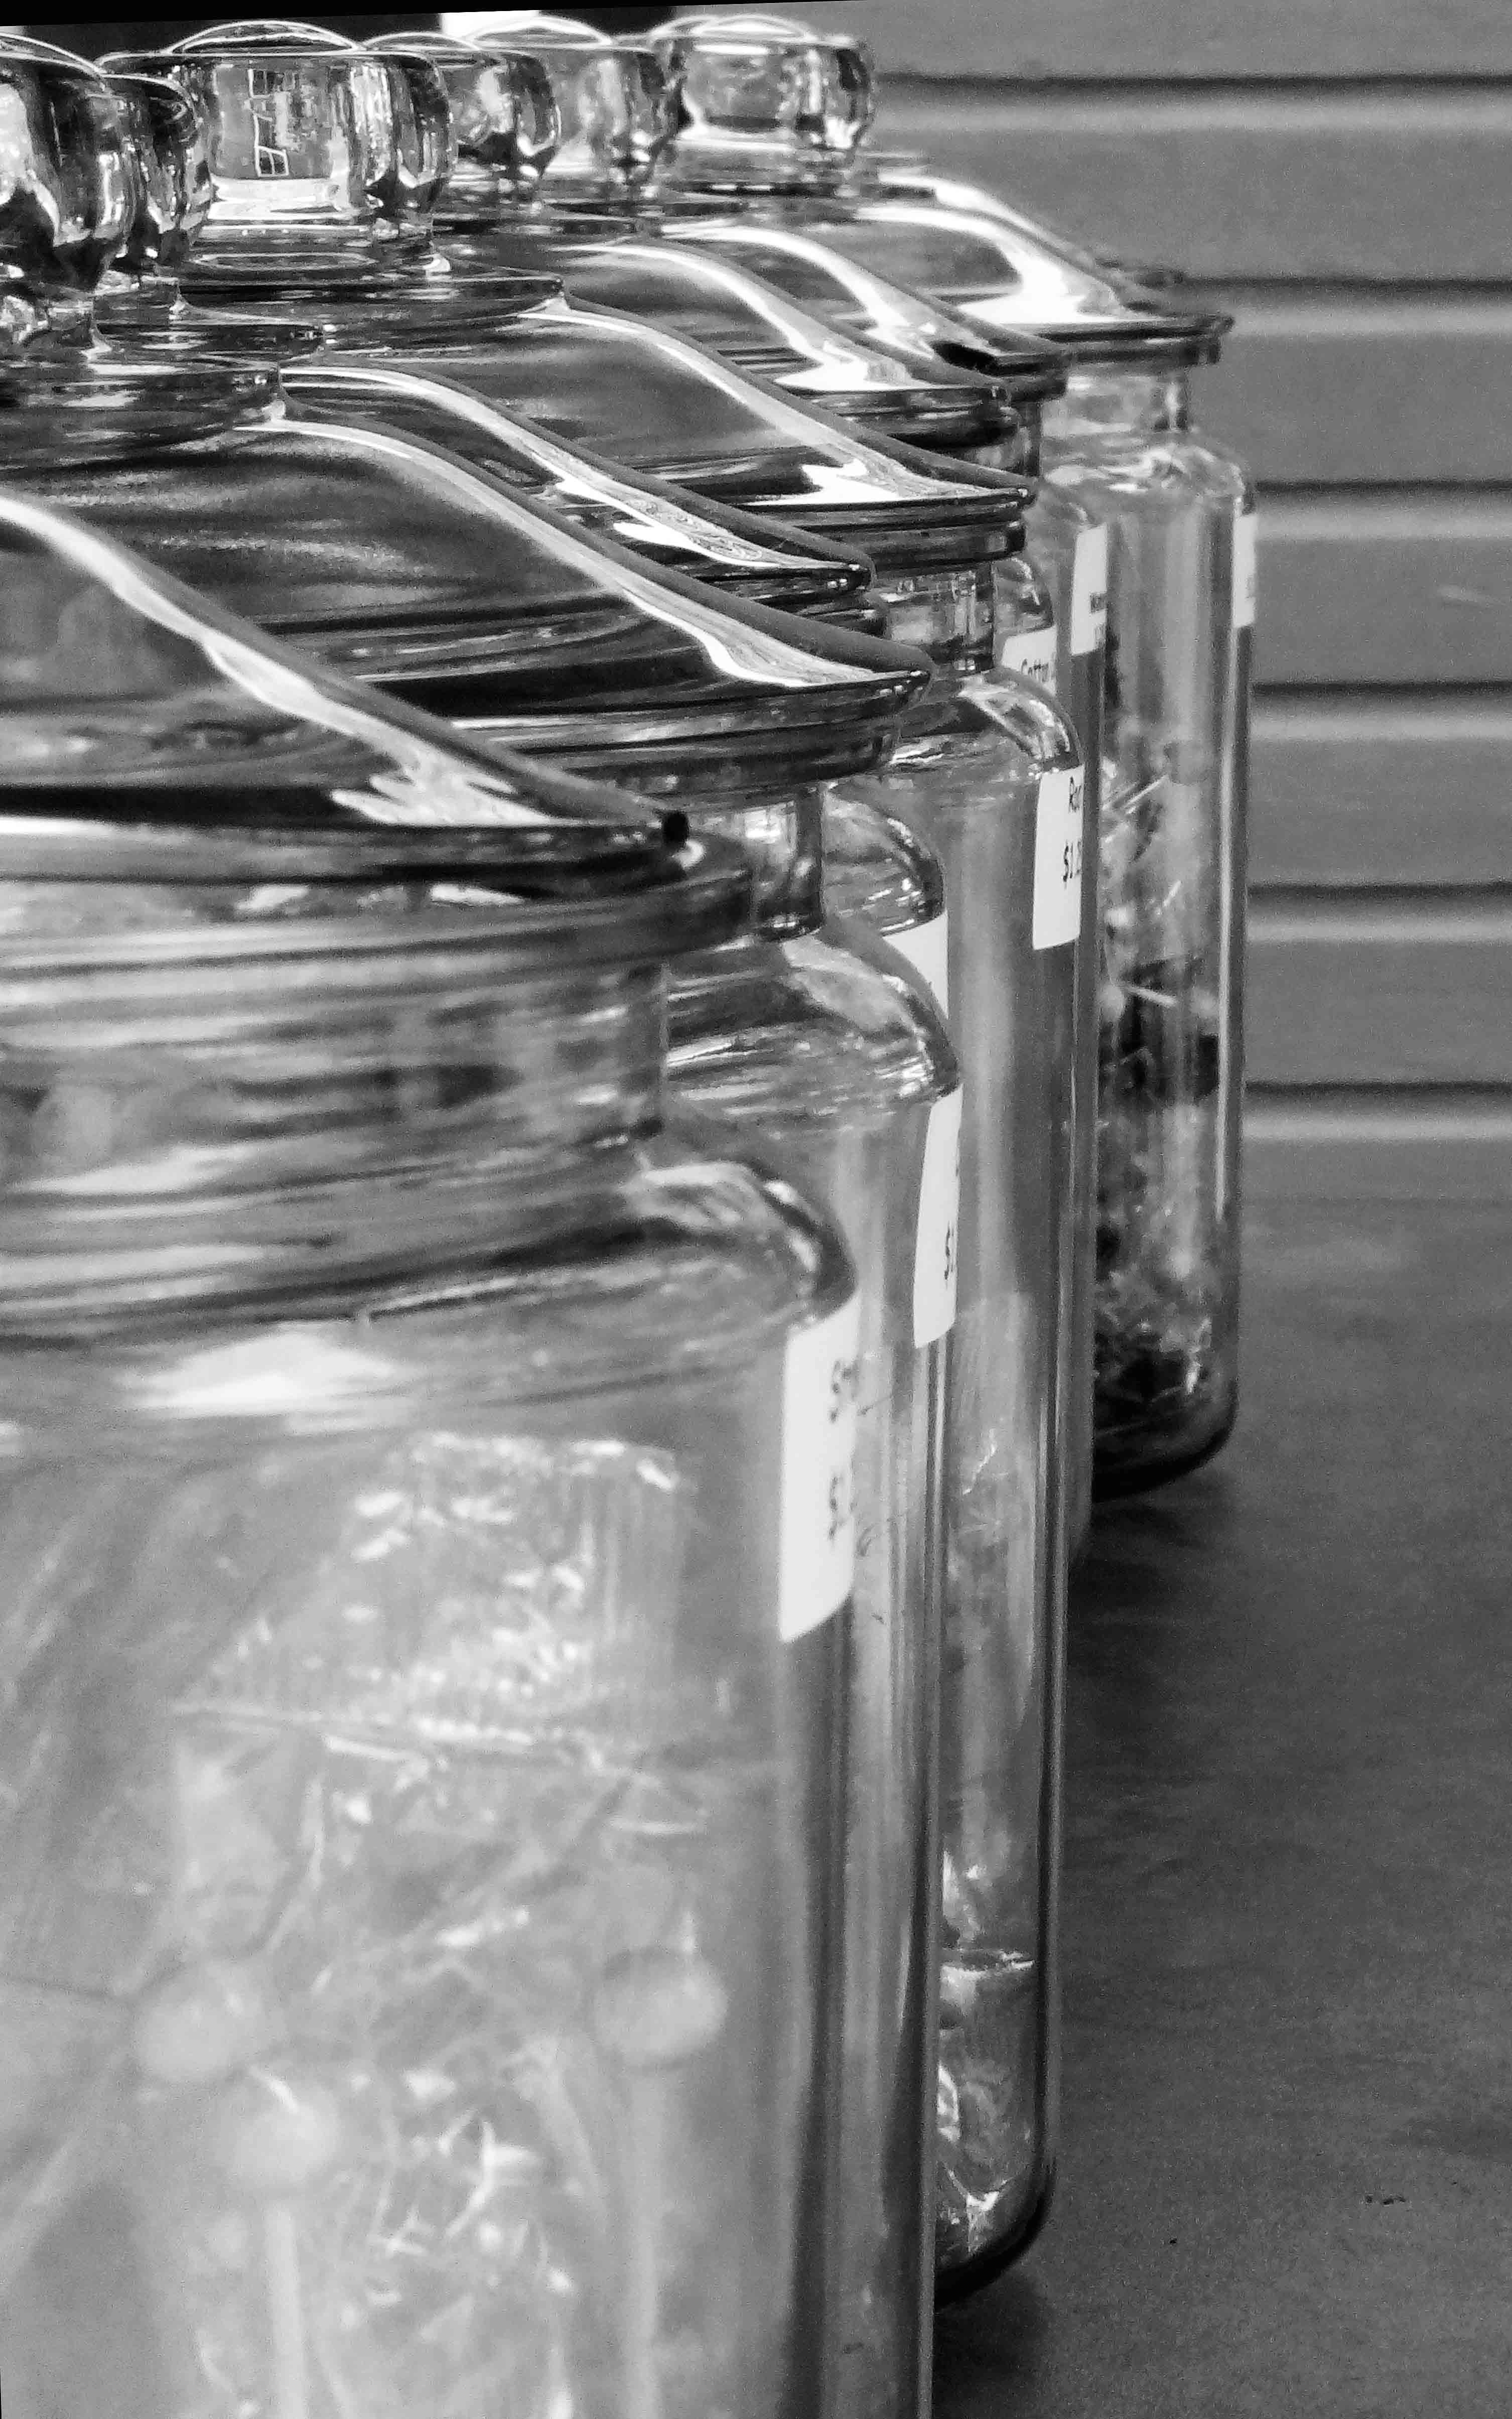 Free stock photo of black and white, glass jars, jars